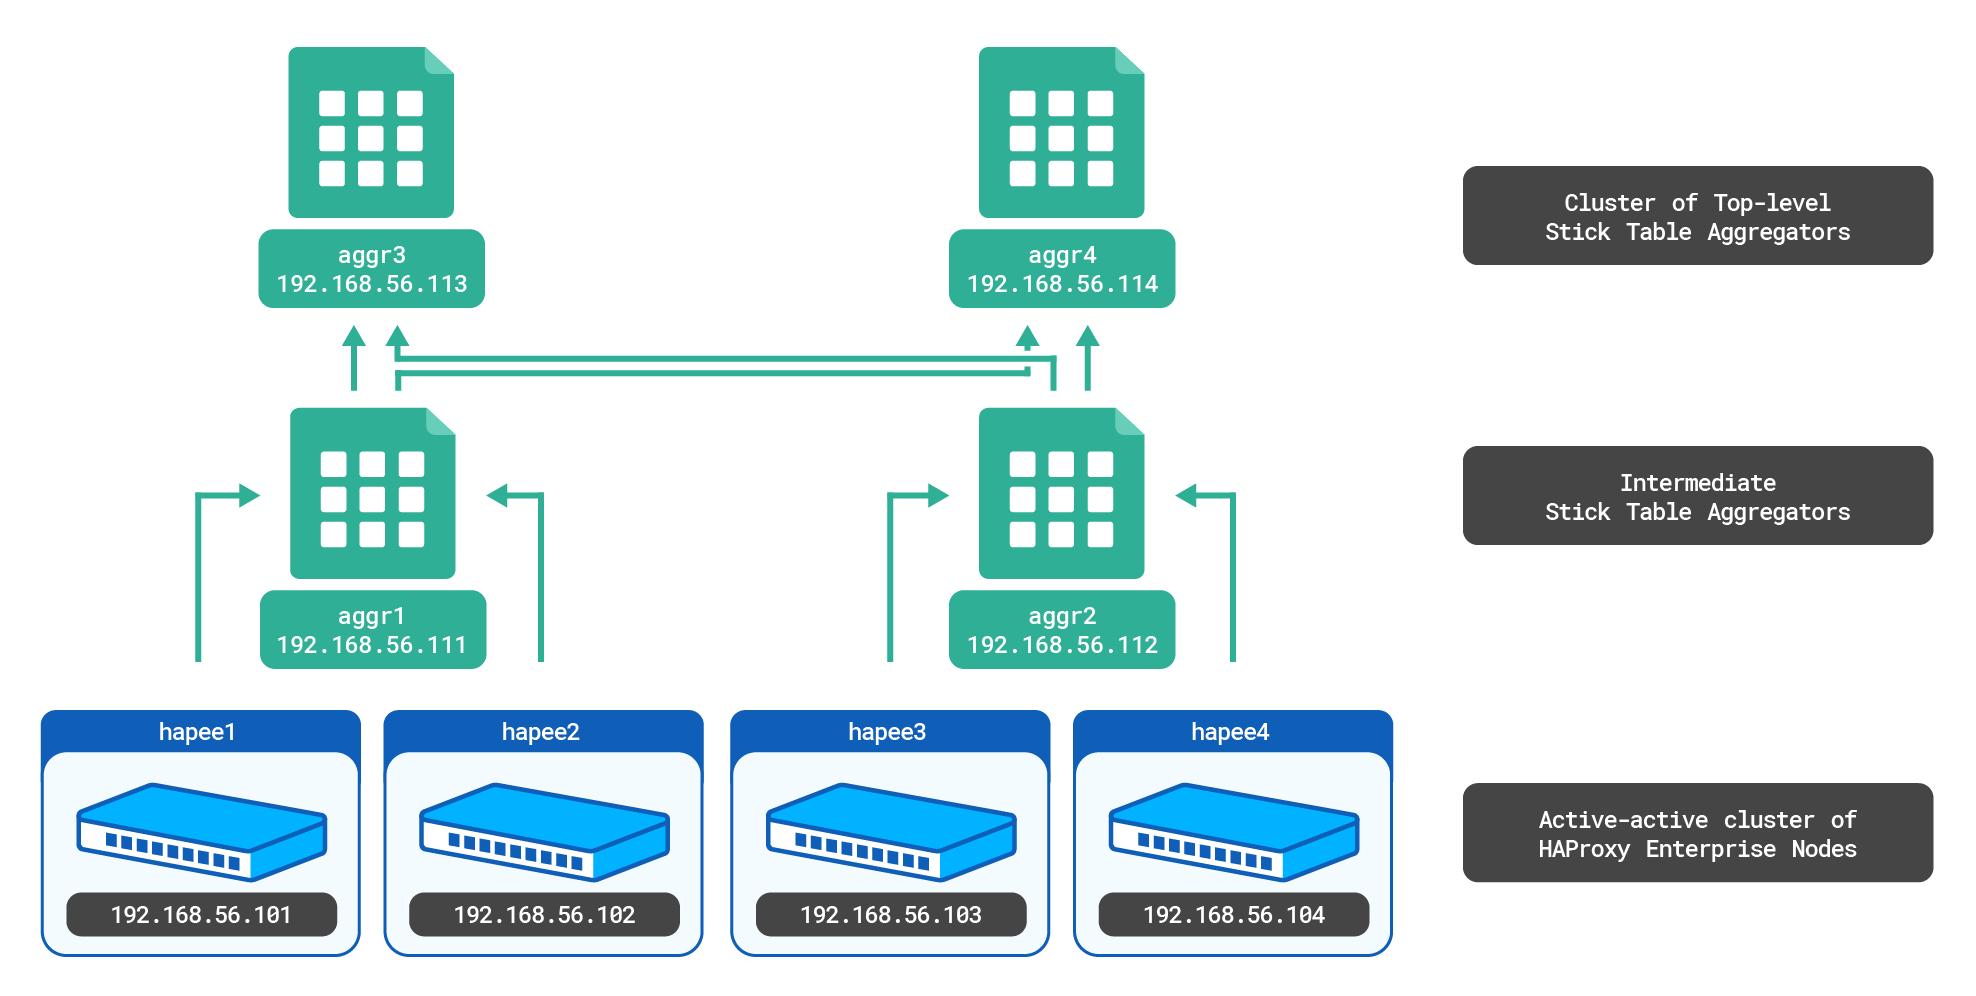 https://cdn.haproxy.com/documentation/hapee/2-2r1/assets/cluster-wide-tracking-ha-setup-3e25d8ecf8c45676e4240bfd3064aa1f880aec0f81fe28afeaf9cd0516086fd7.png